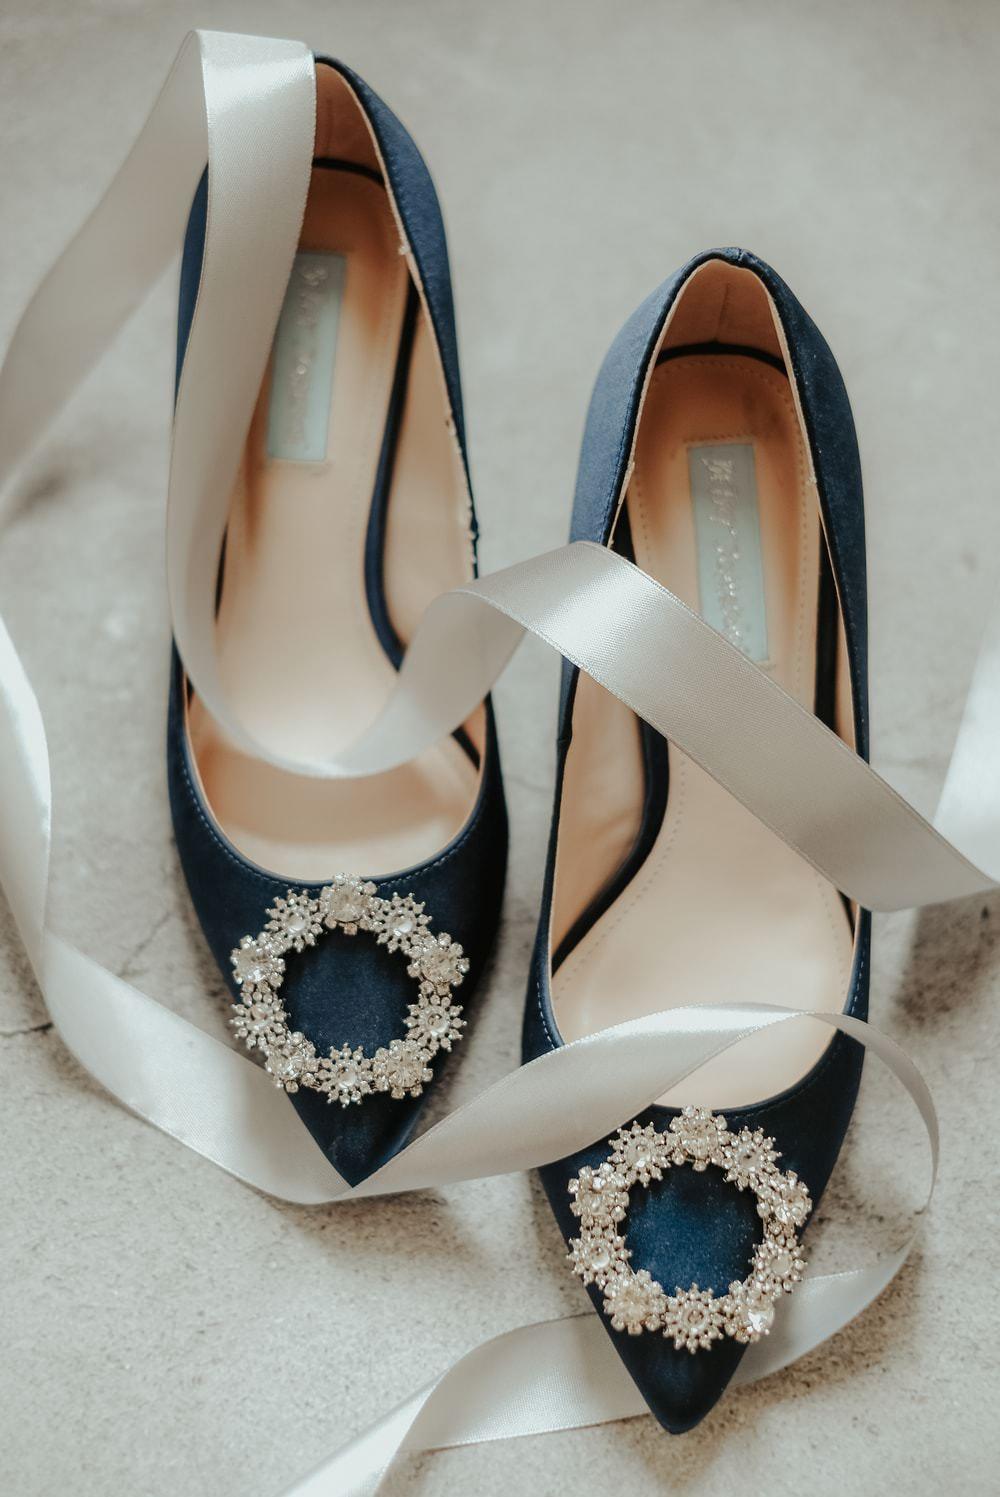 Blue Shoes Bride Bridal Philippines Wedding The Backyard Studios